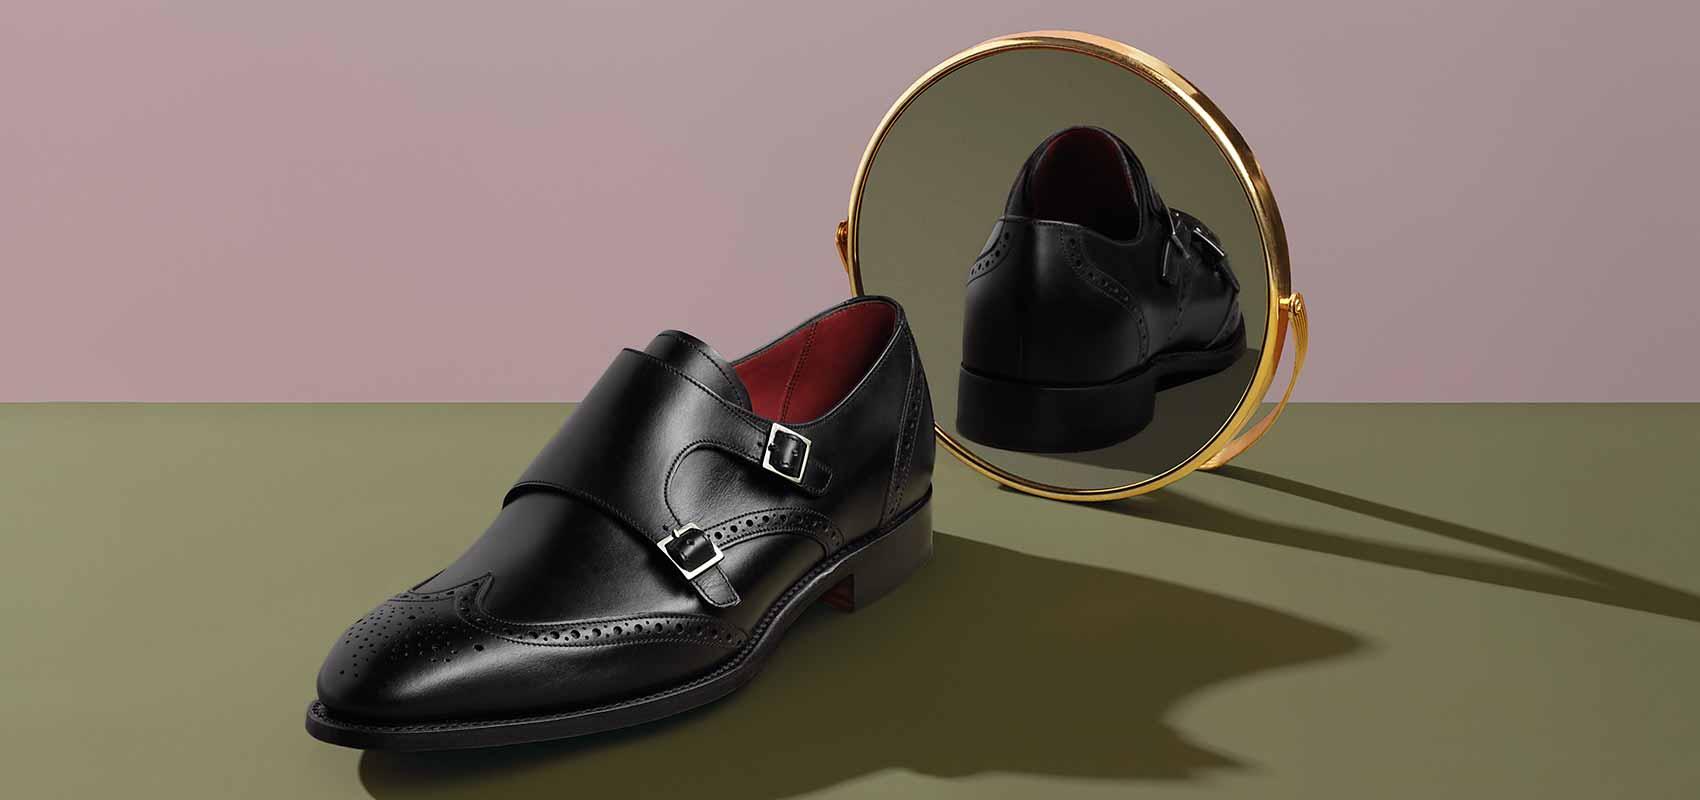 Charles Tyrwhitt Chaussures à boucles